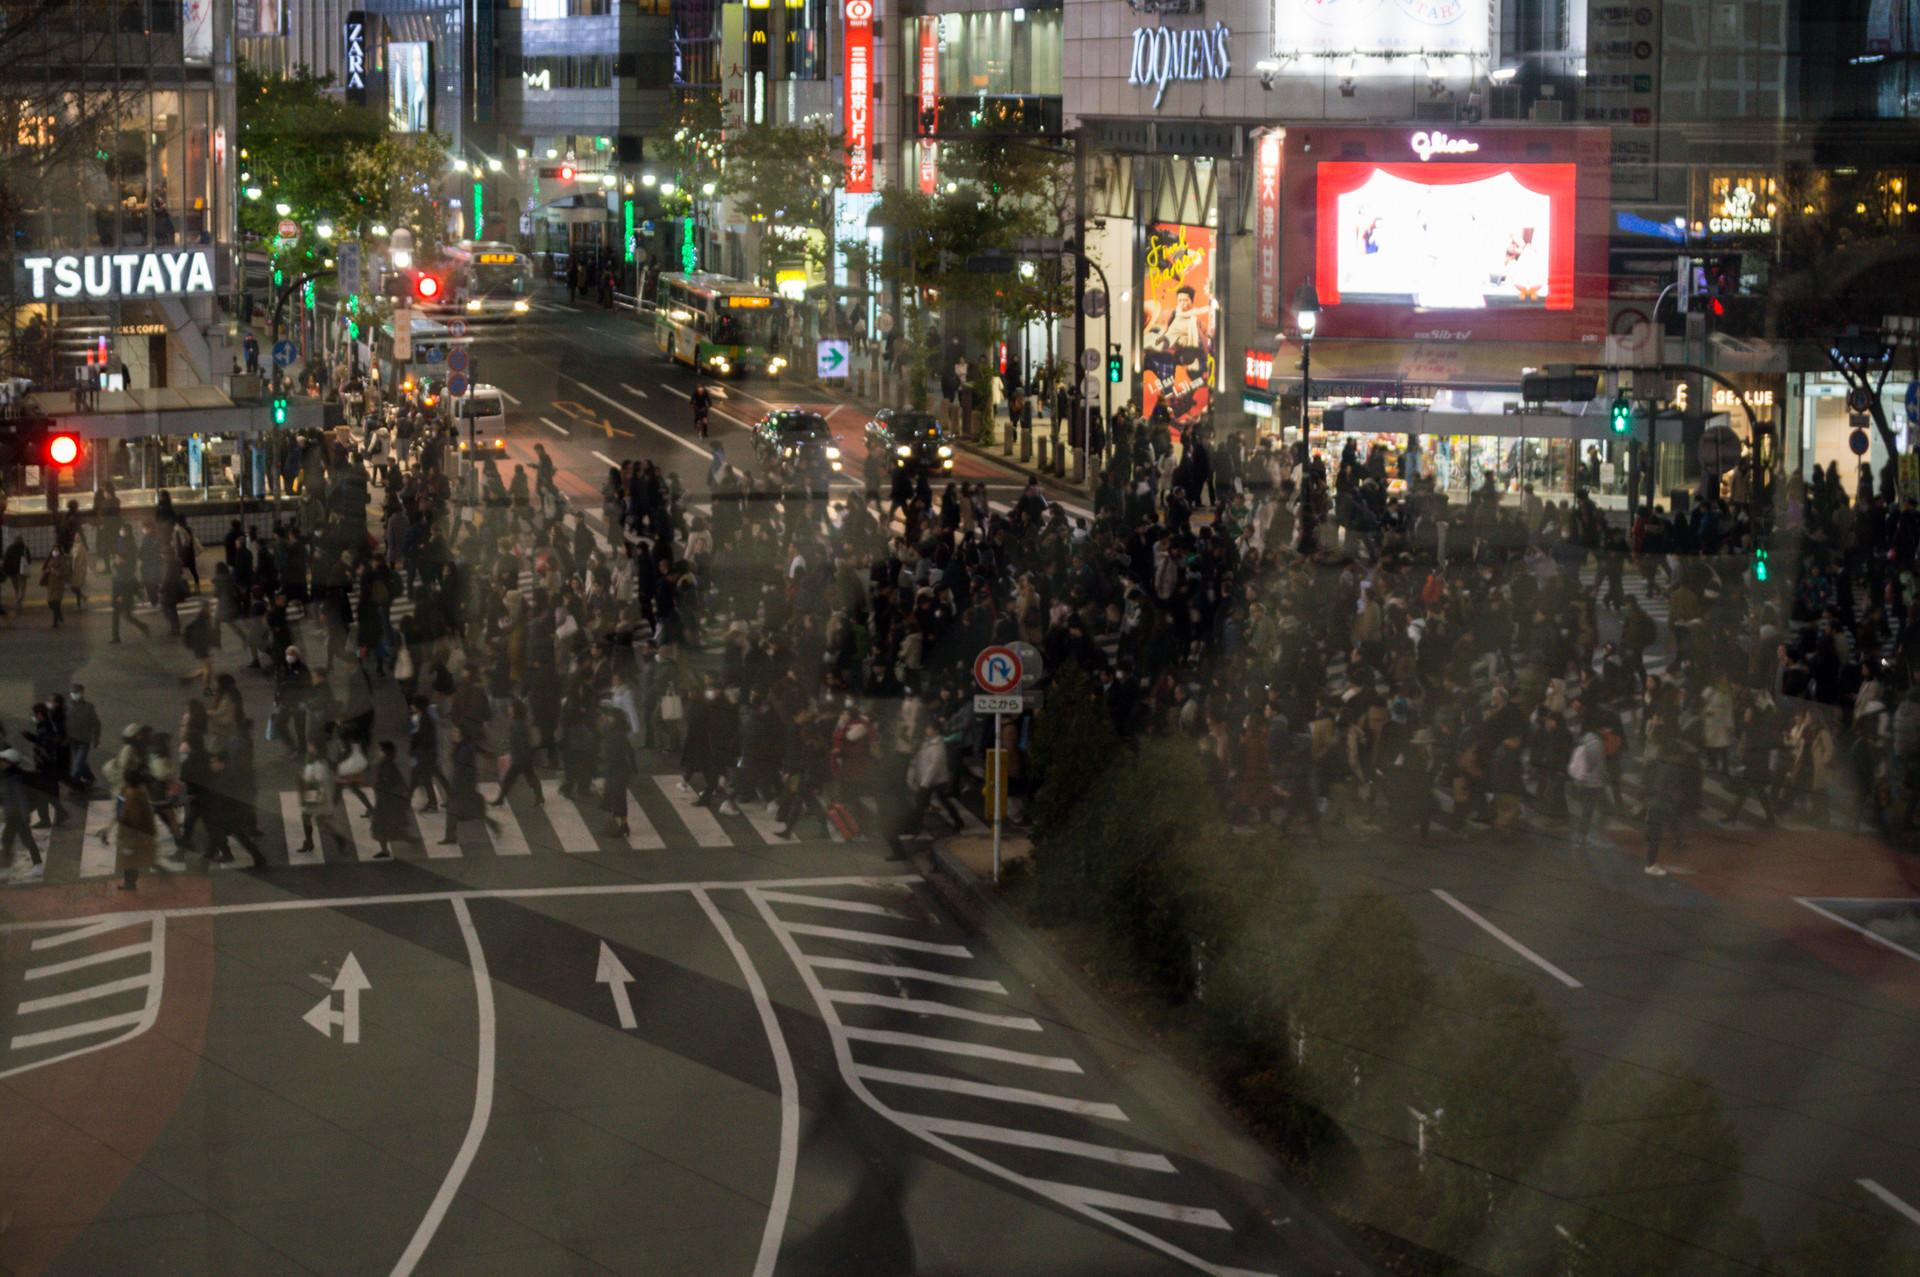 Shibuya Crossing, Tokyo / Japan · 2016